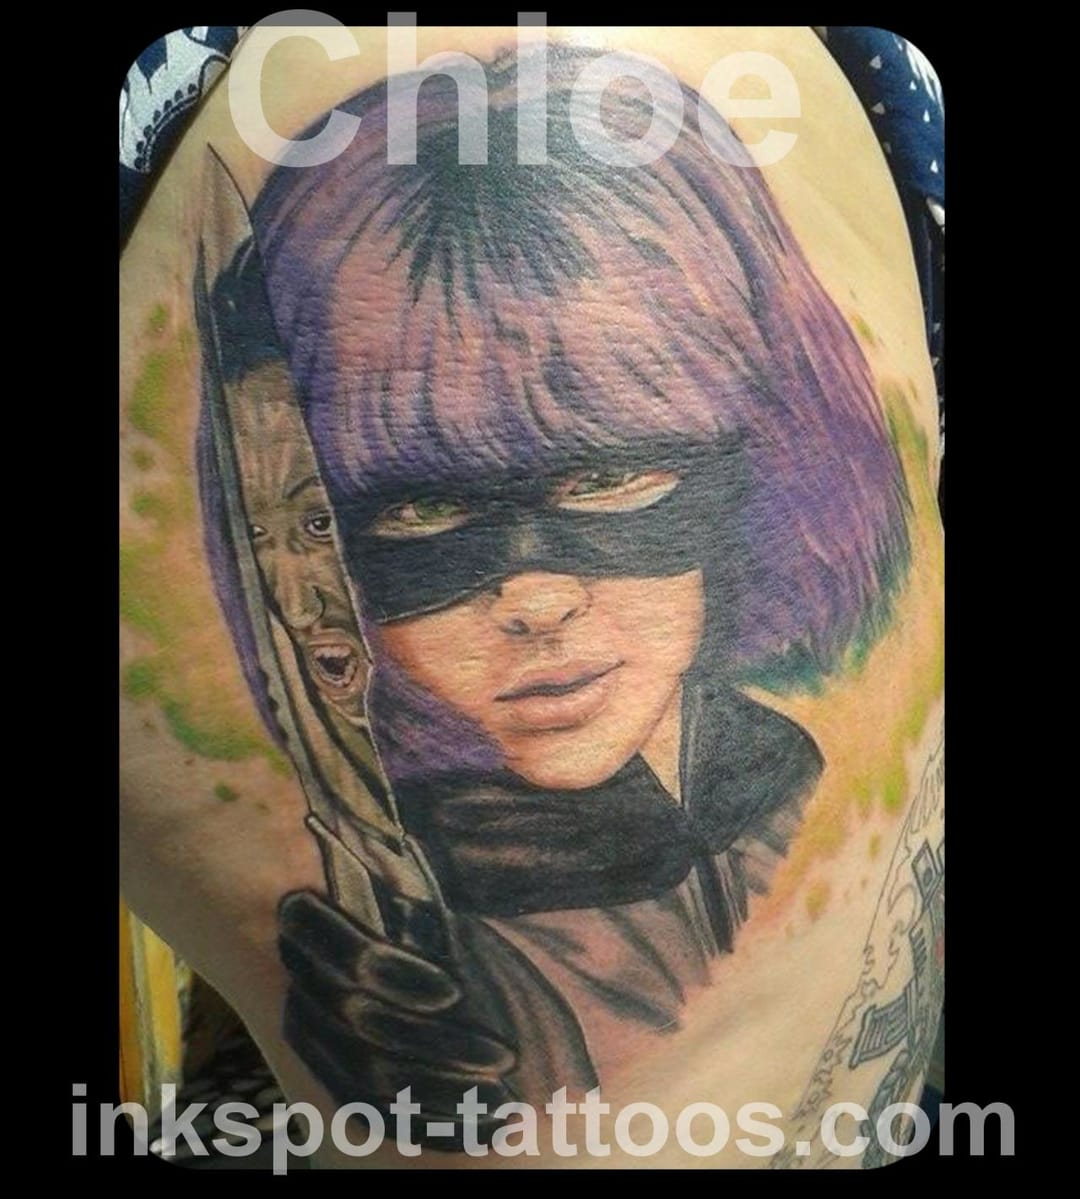 Hit-Girl tattoo